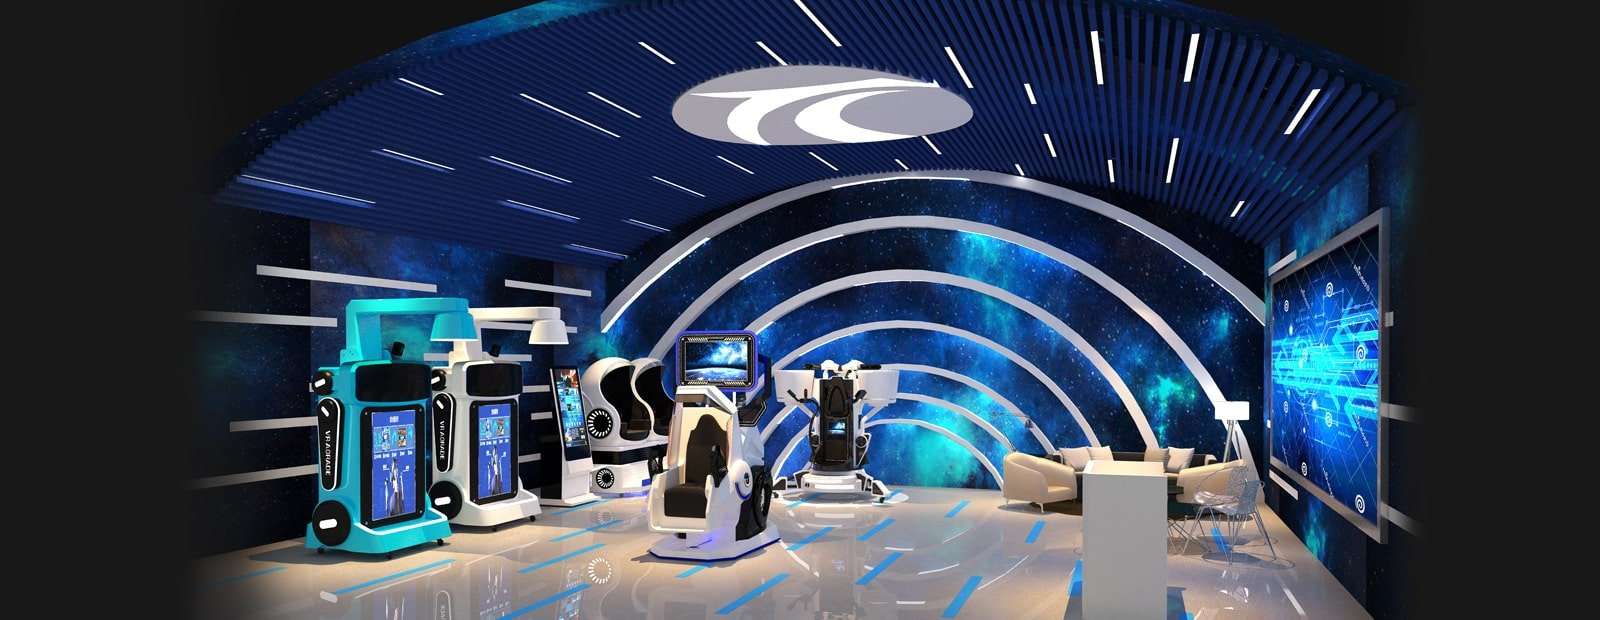 VR theme park China 70 Square Meter